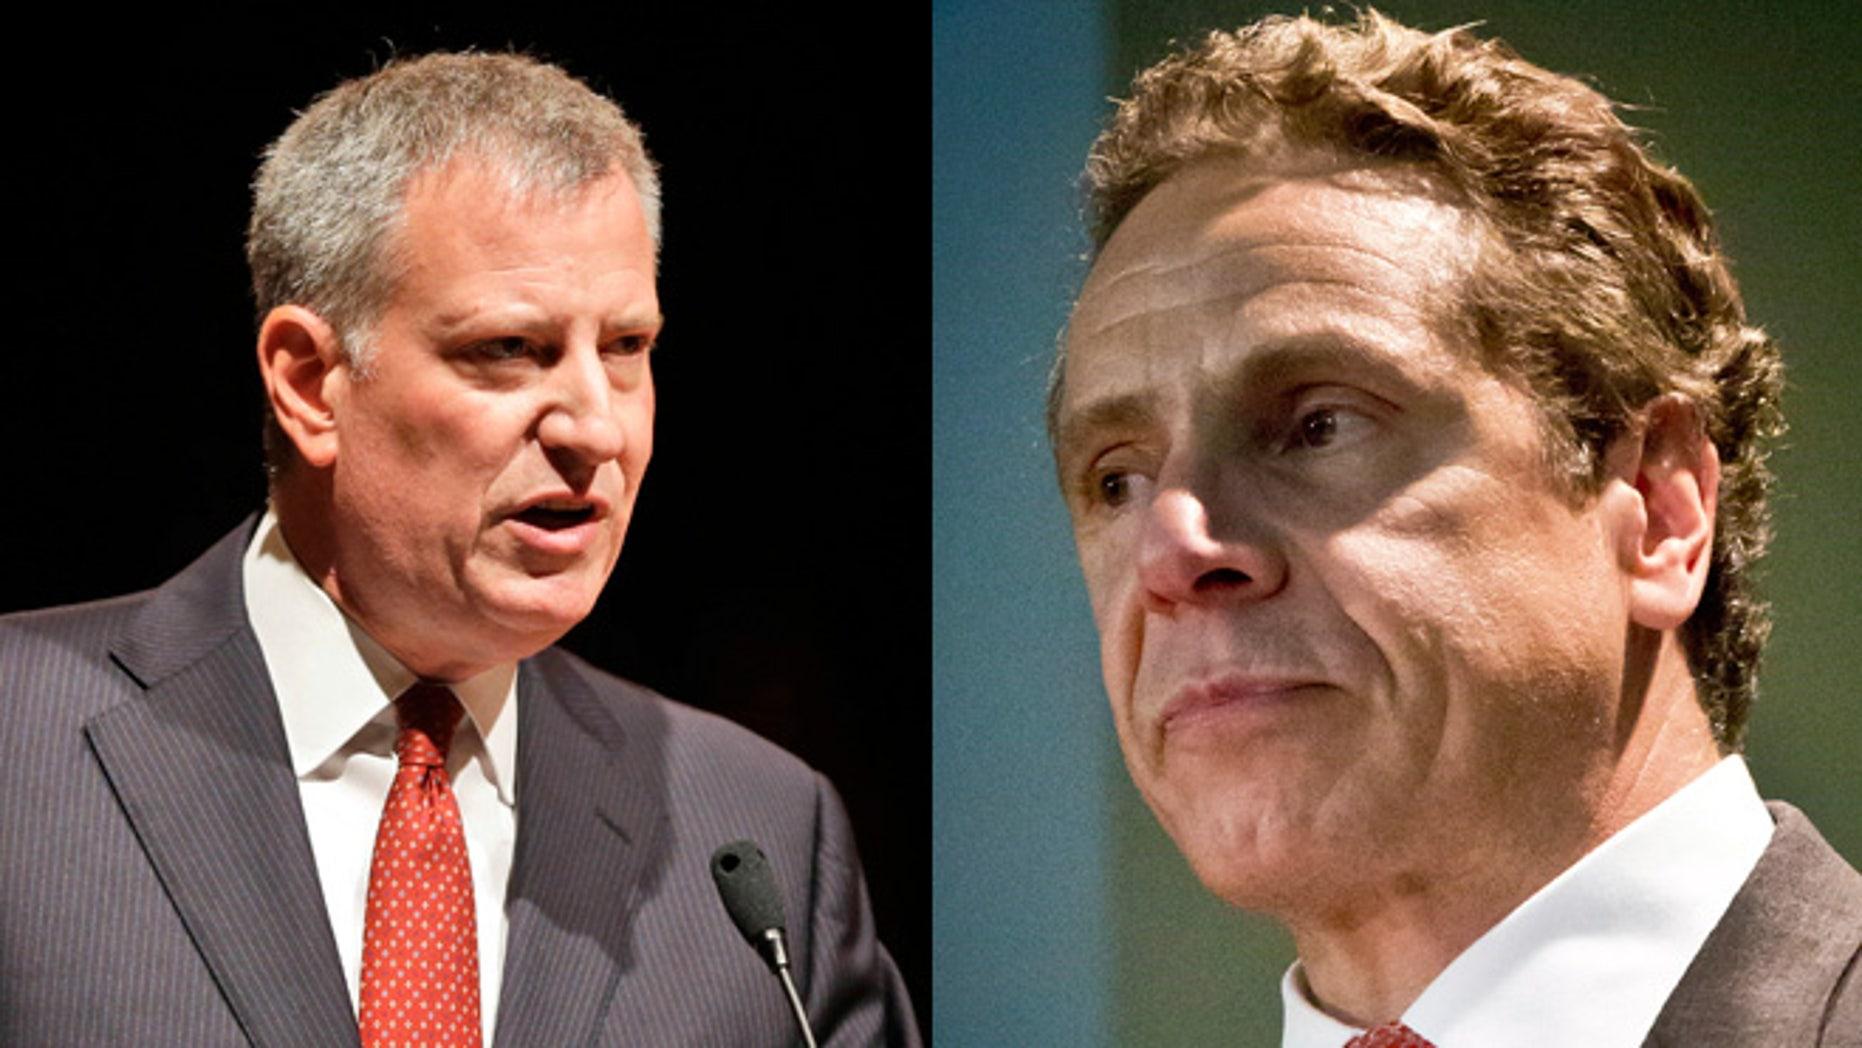 New York Mayor Bill de Blasio (left) and New York Gov. Andrew Cuomo (right).